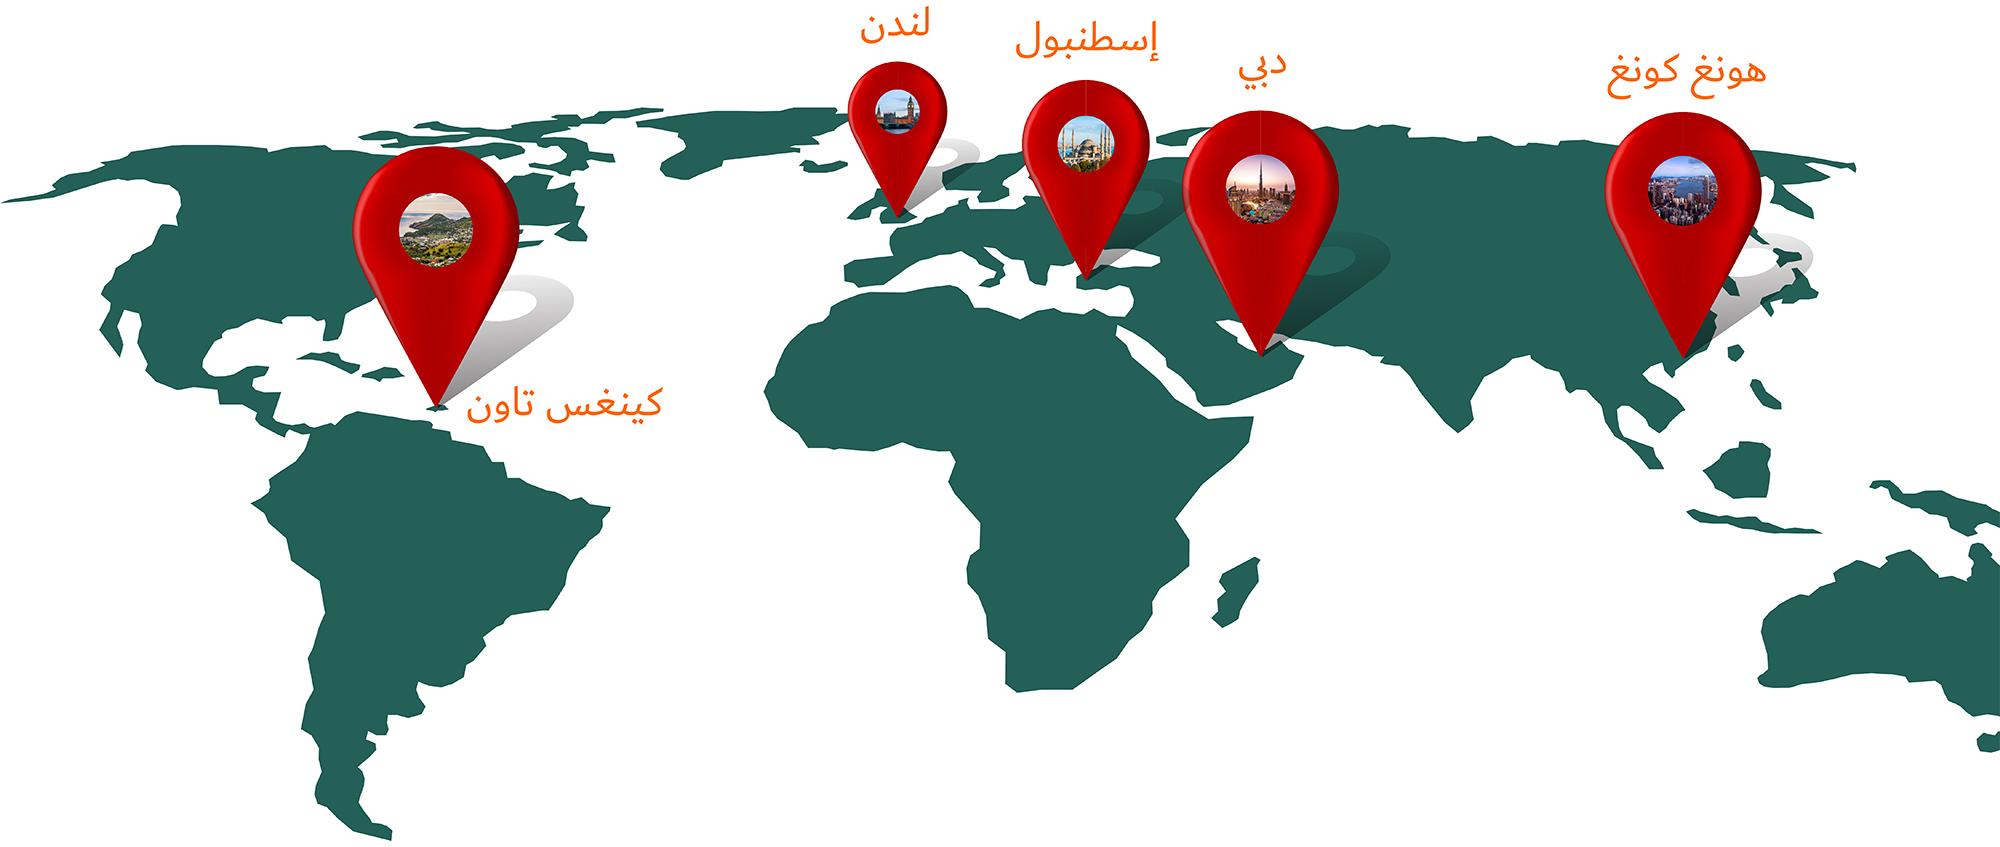 map-otm-arabic